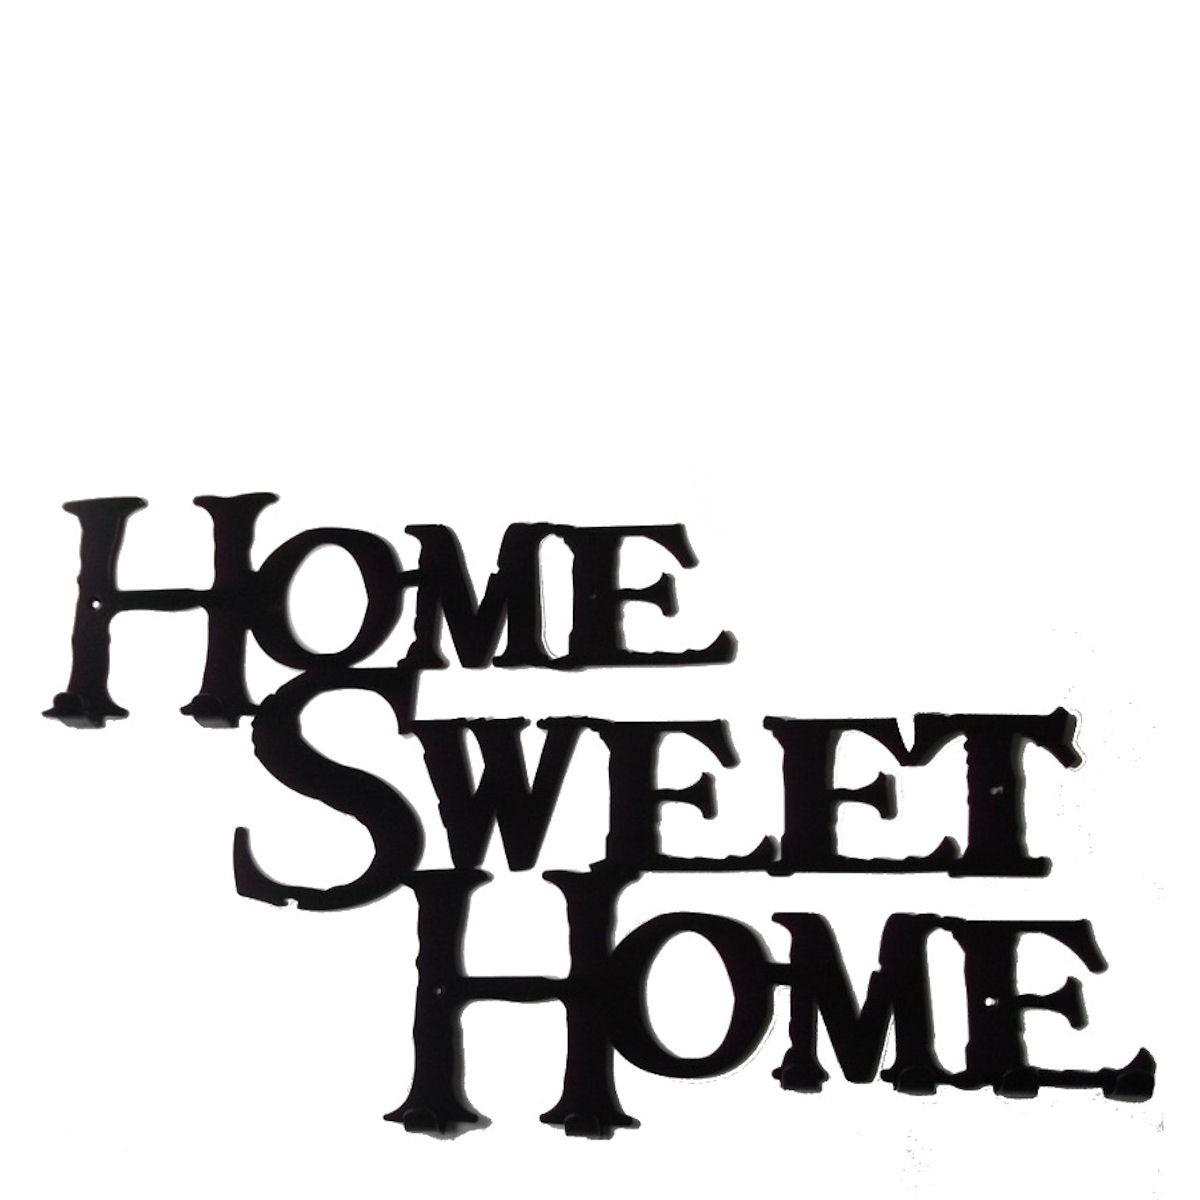 Wieszak na ubrania xl briso design home sweet home hsh xl sklep Home ubrania